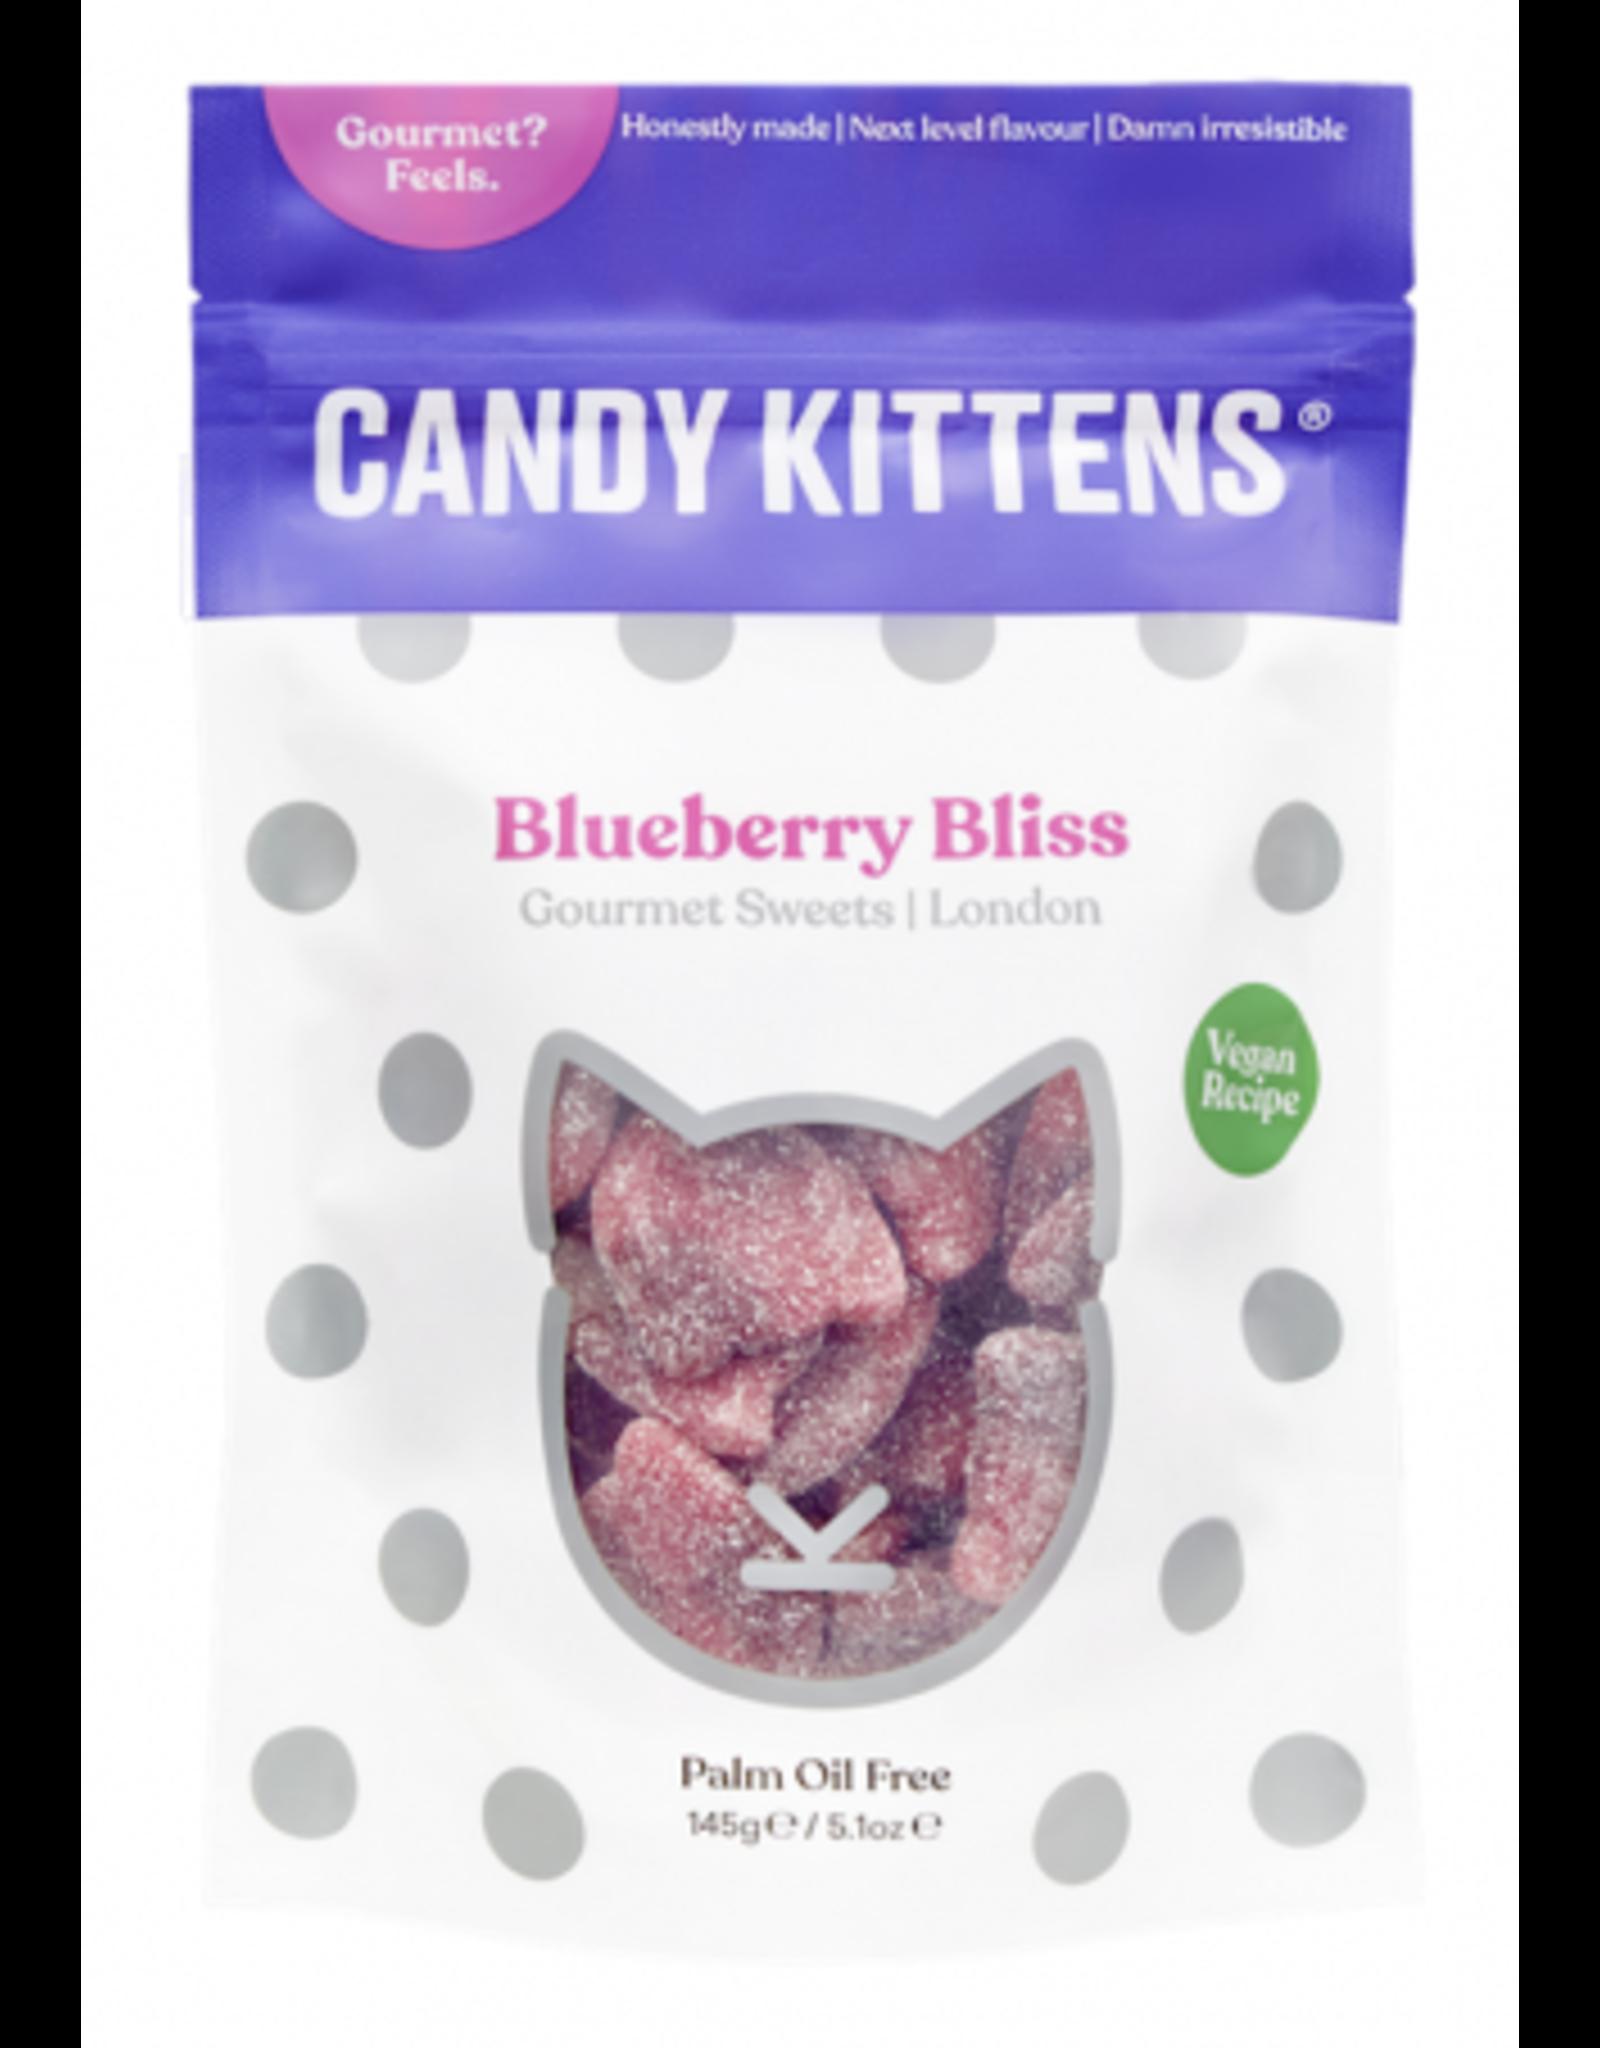 Candy Kittens Candy Kittens Blueberry Bliss 125g